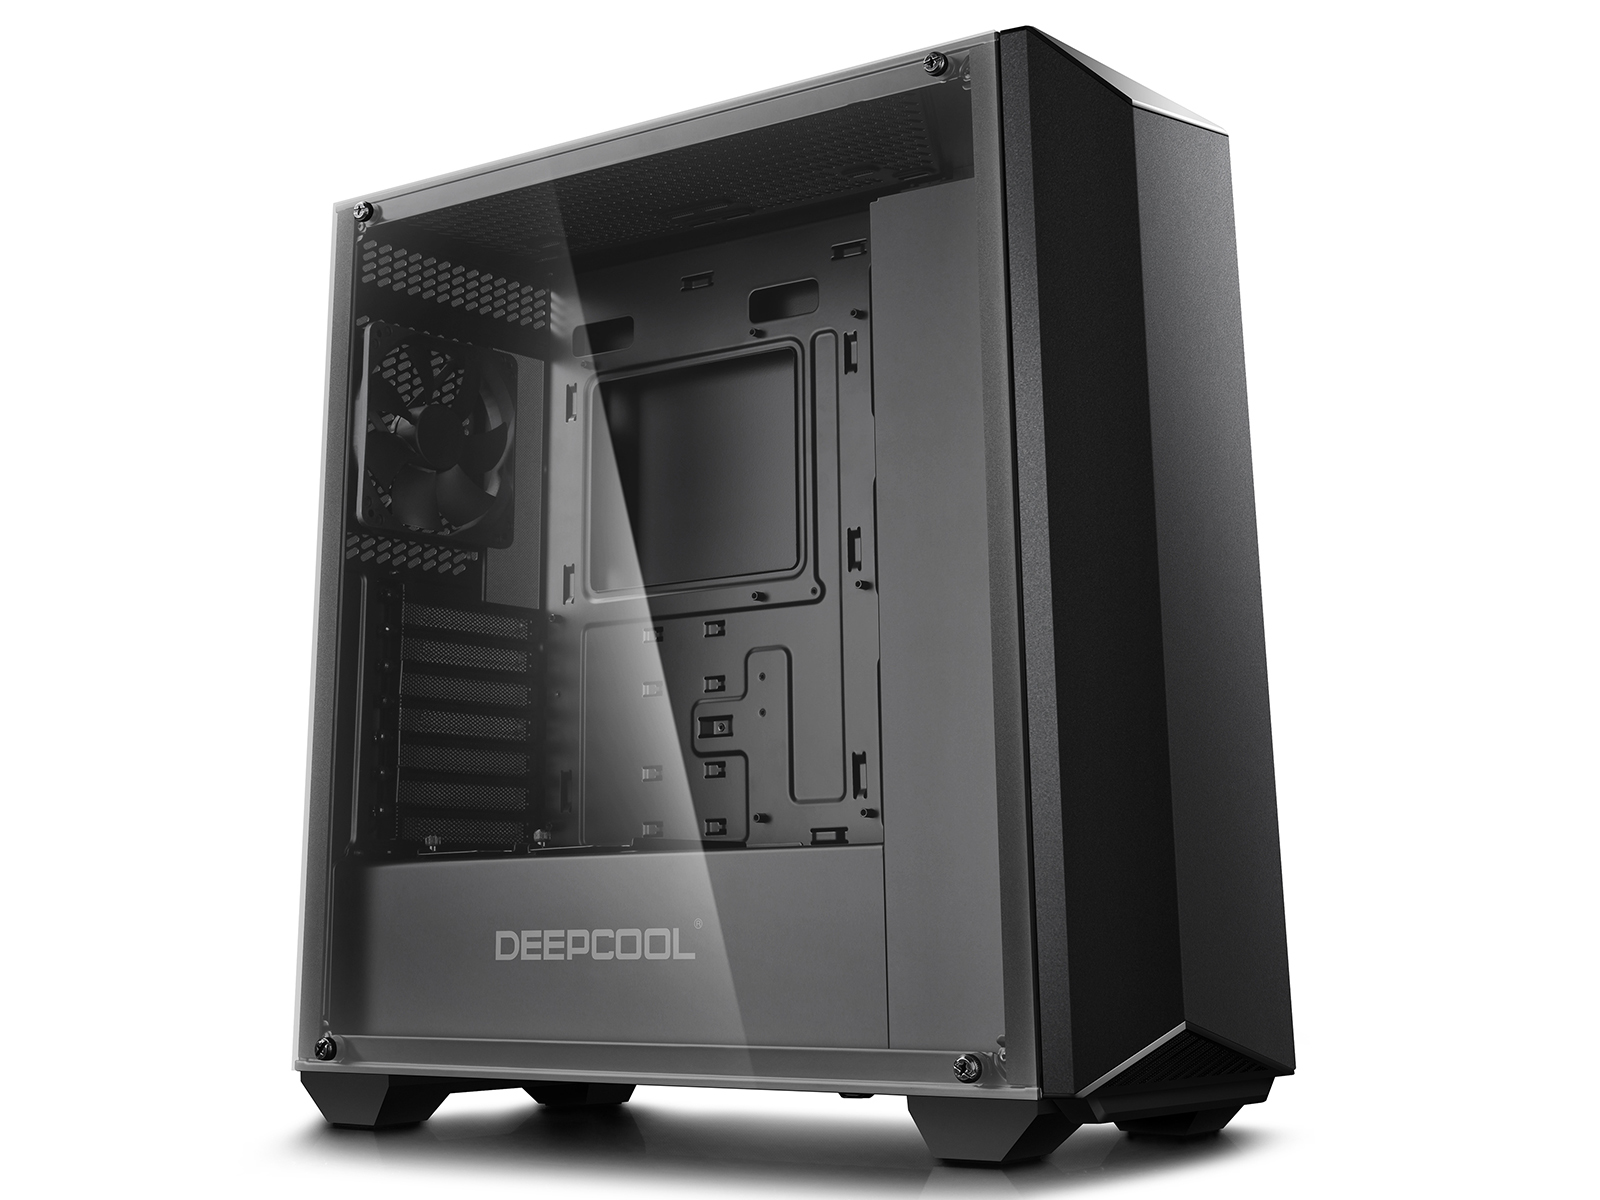 Deepcool Earlkase RGB Case w/ Expandable RGB Lighting image